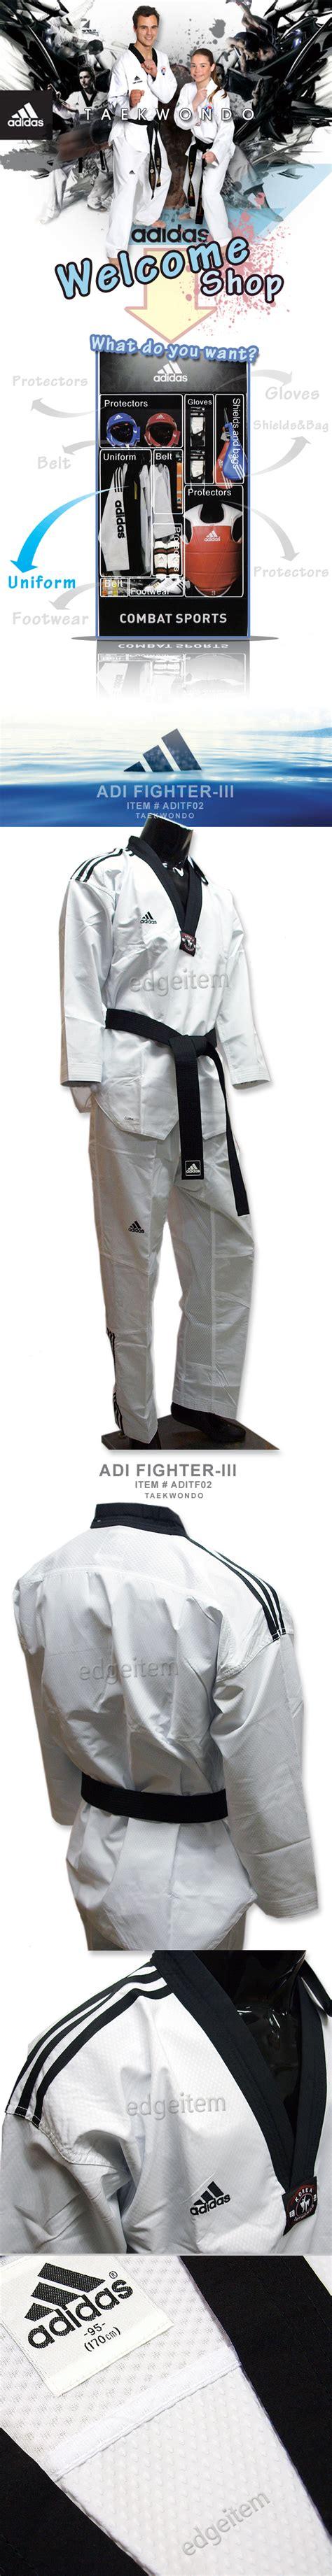 Dobok Adidas Fighter New Iii adidas adi fighter new 3 stripe taekwondo dobok tkd tae kwon do ebay